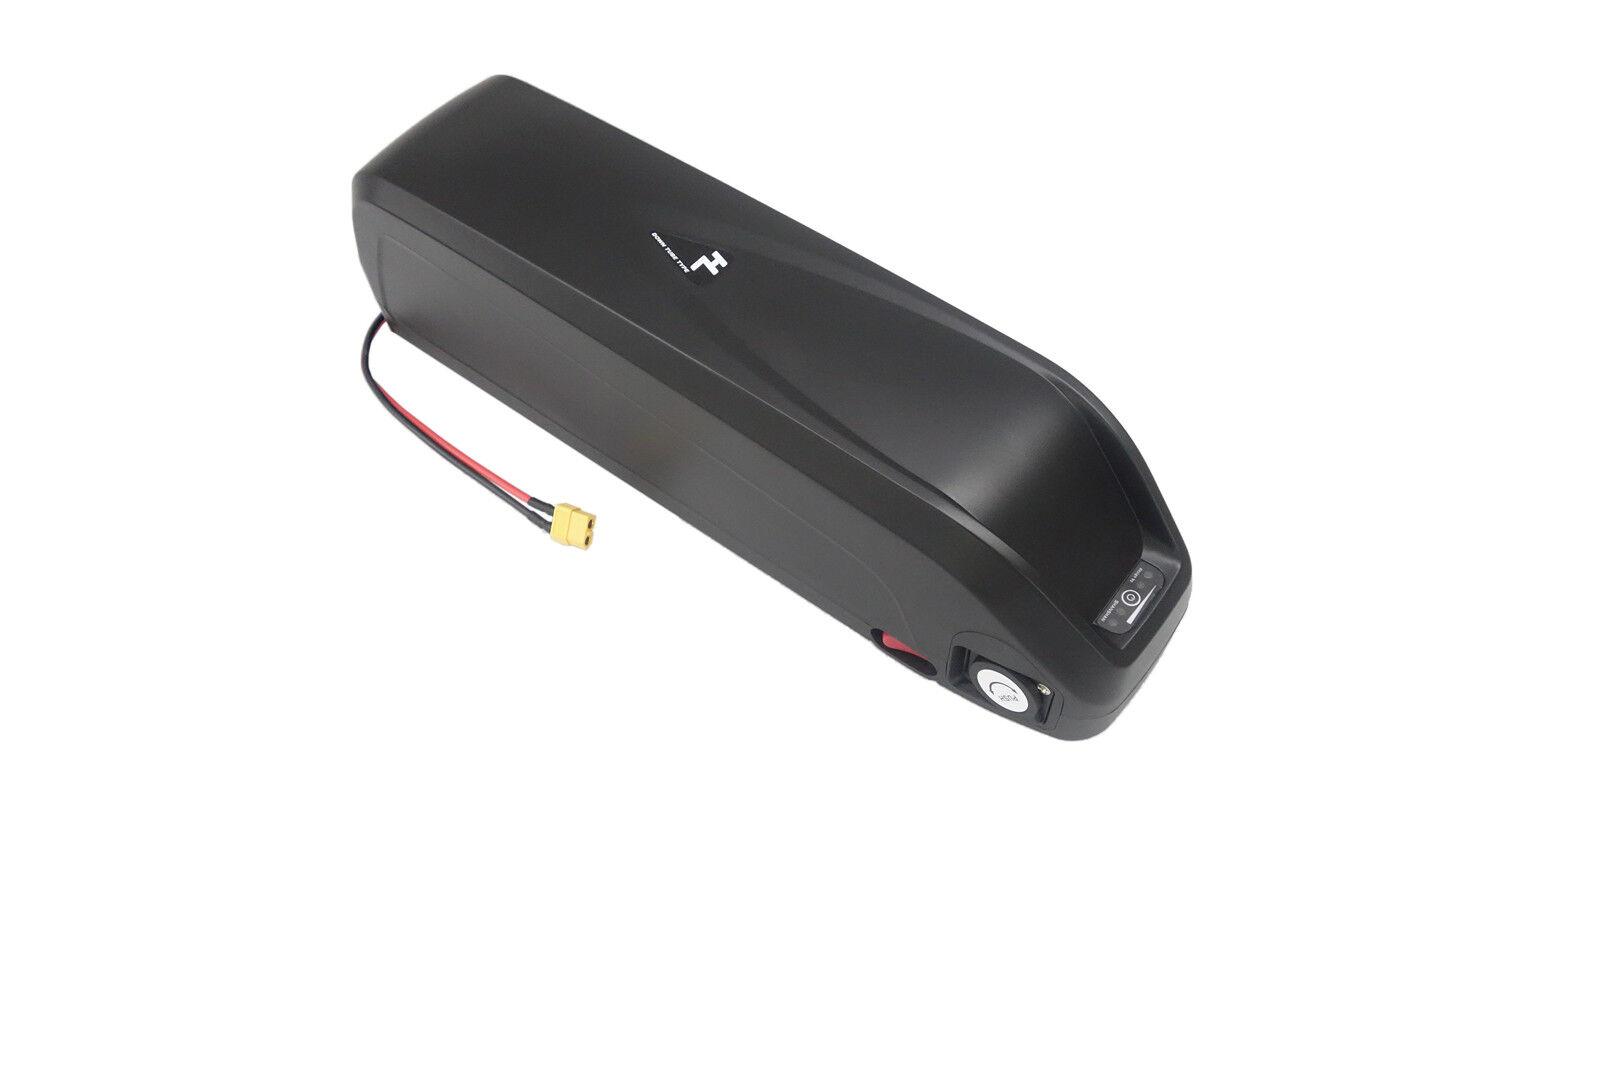 E-Bike Akku 36V 15.6AH Pedelec Umbausatz Li-Ion Rahmenakku Trinkflaschenakku  USB  fast shipping